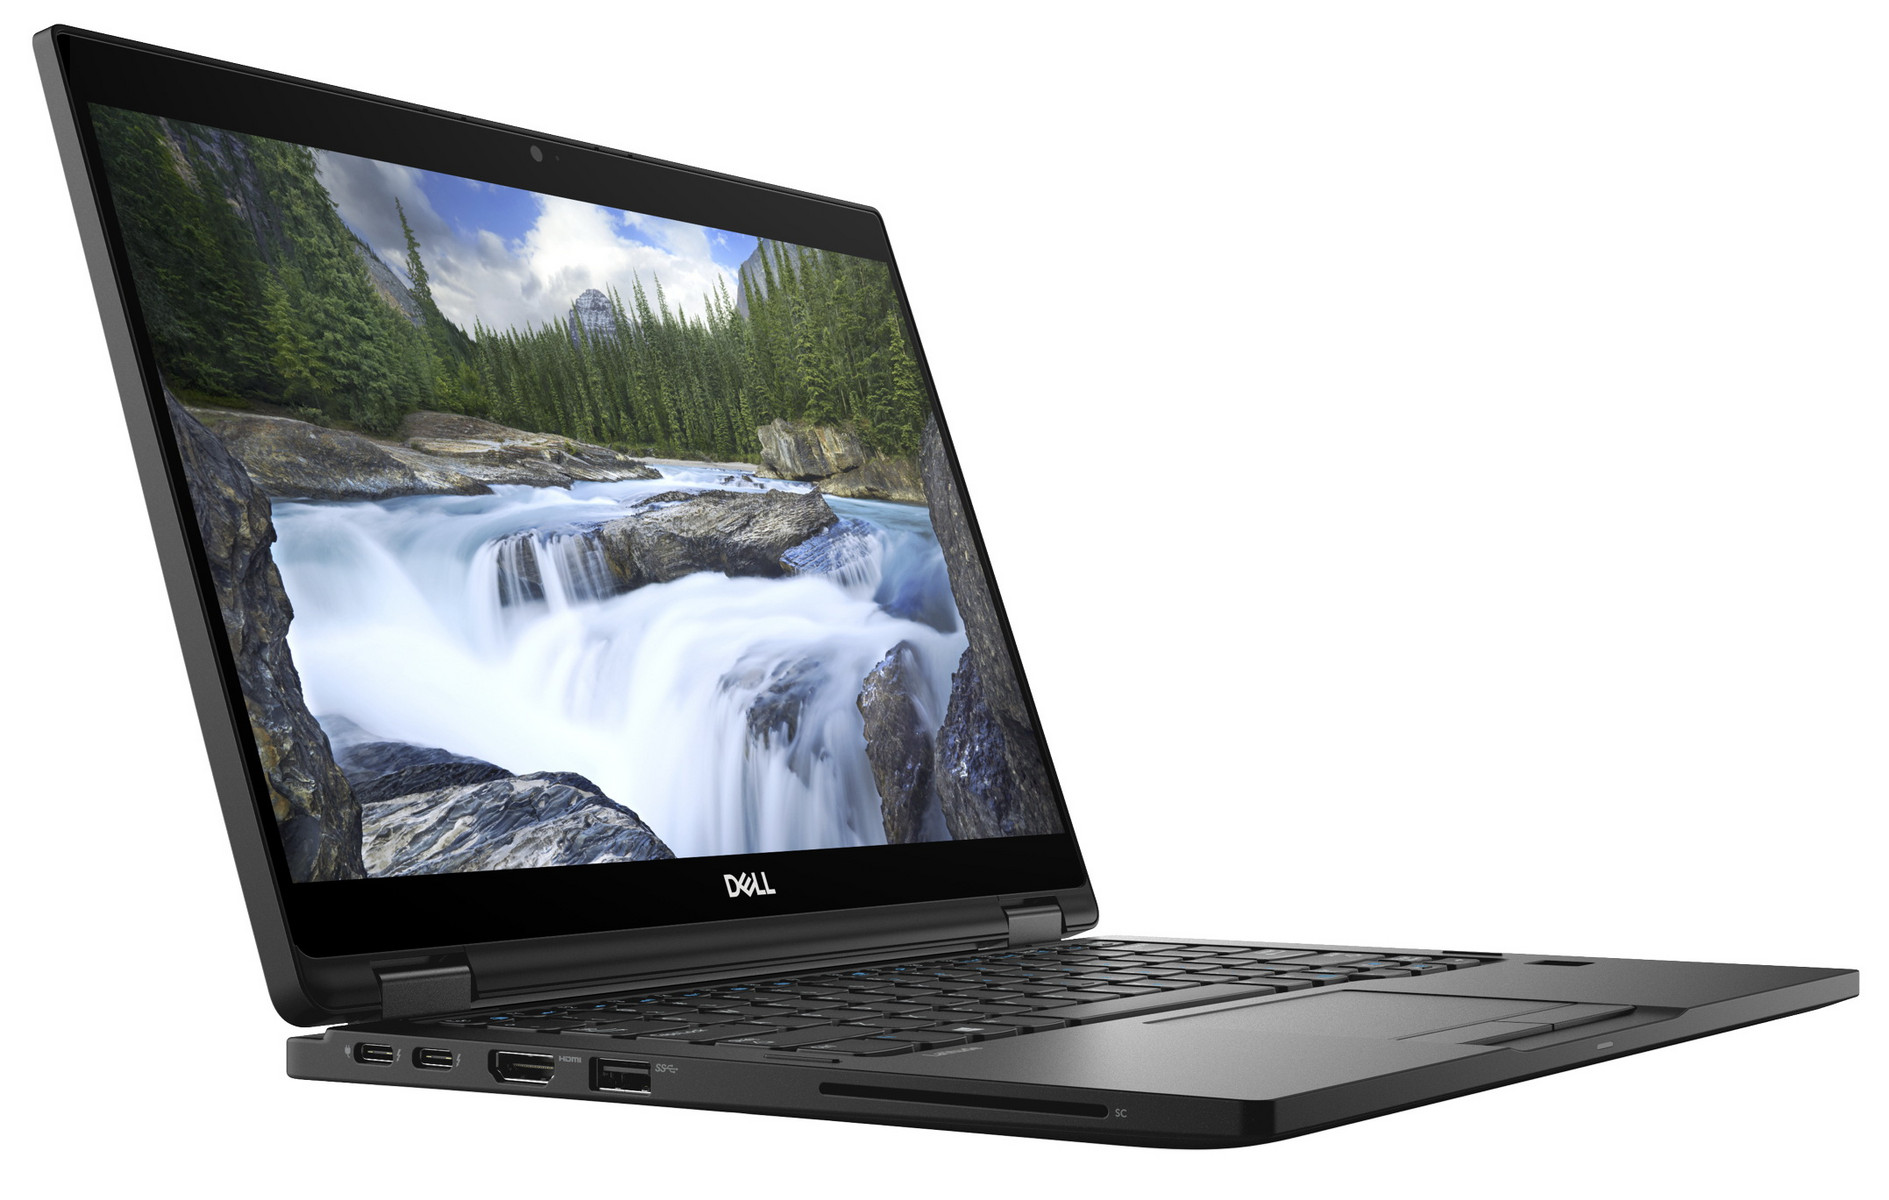 Ultrabook Dell Latitude 7389 13.3 Full HD Touch Intel Core i7-7600U RAM 16GB SSD 512GB Windows 10 Pro